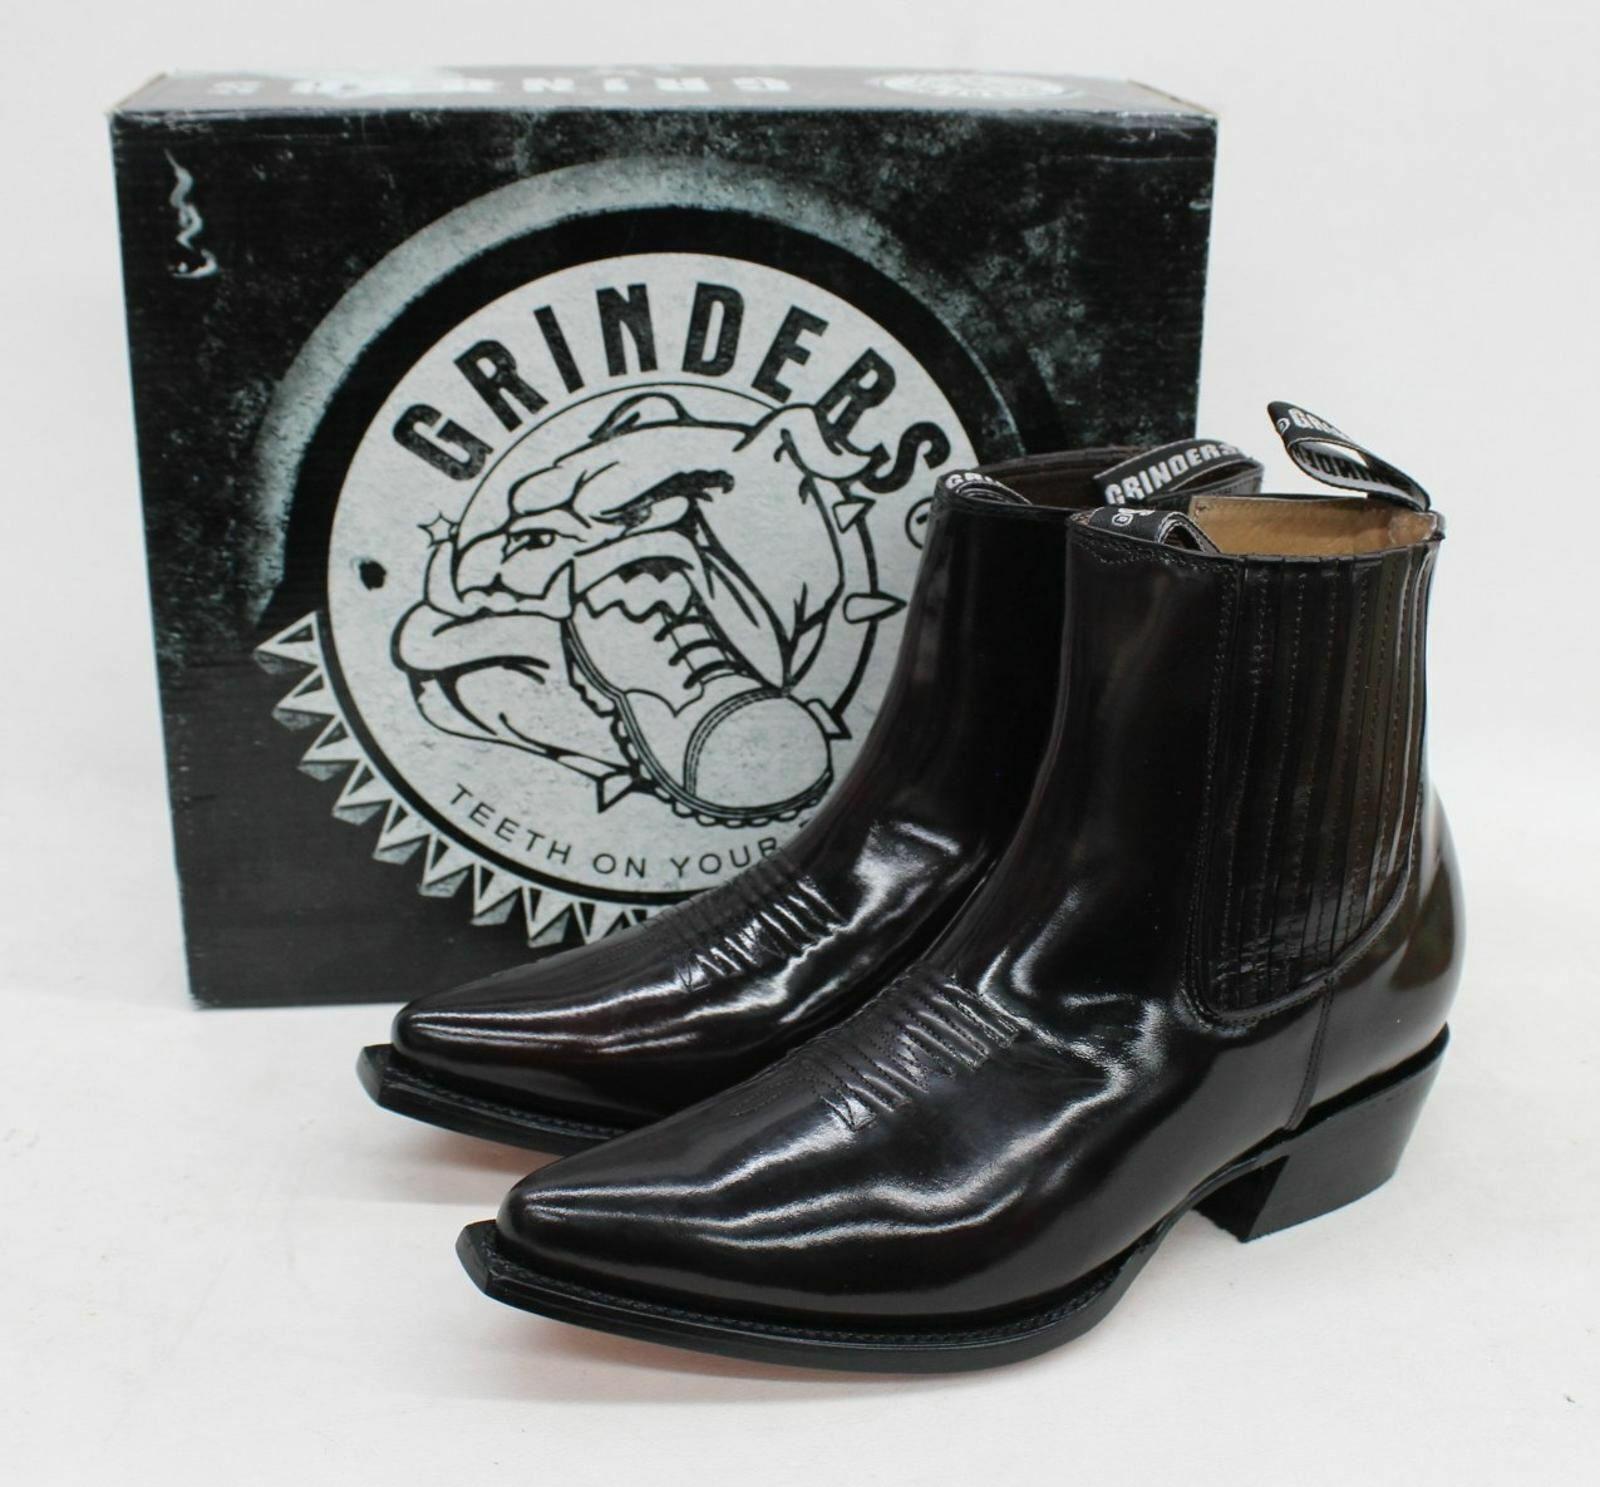 GRINDERS Men's Burgundy Austin Leather Cowboy Ankle Zip Boots UK10 EU44 BNIB